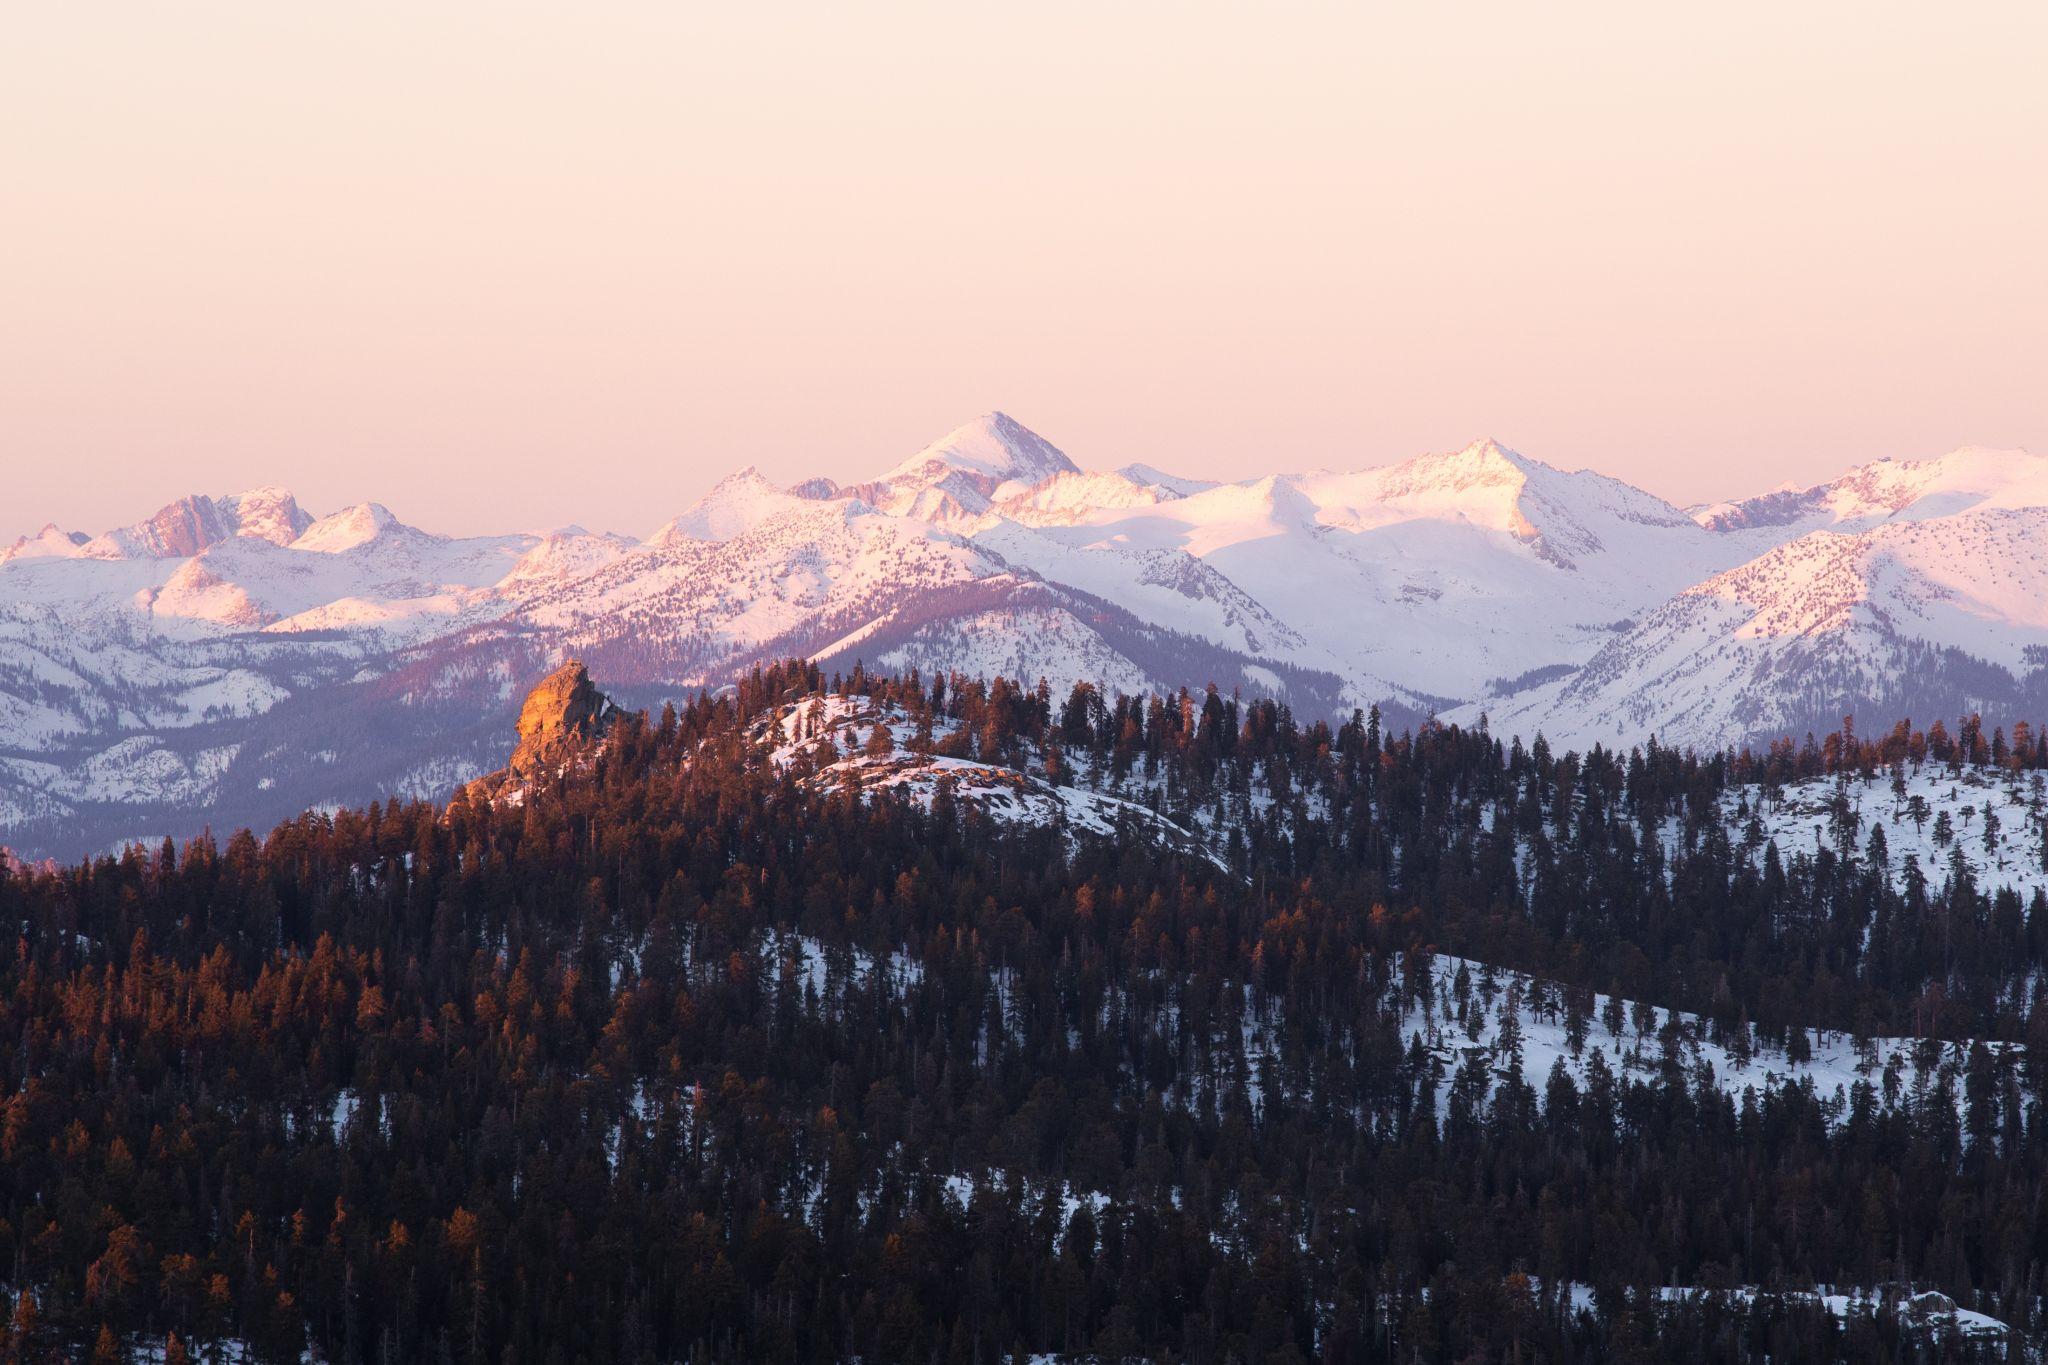 Disney's failed attempt to build a massive ski resort in the California wilderness